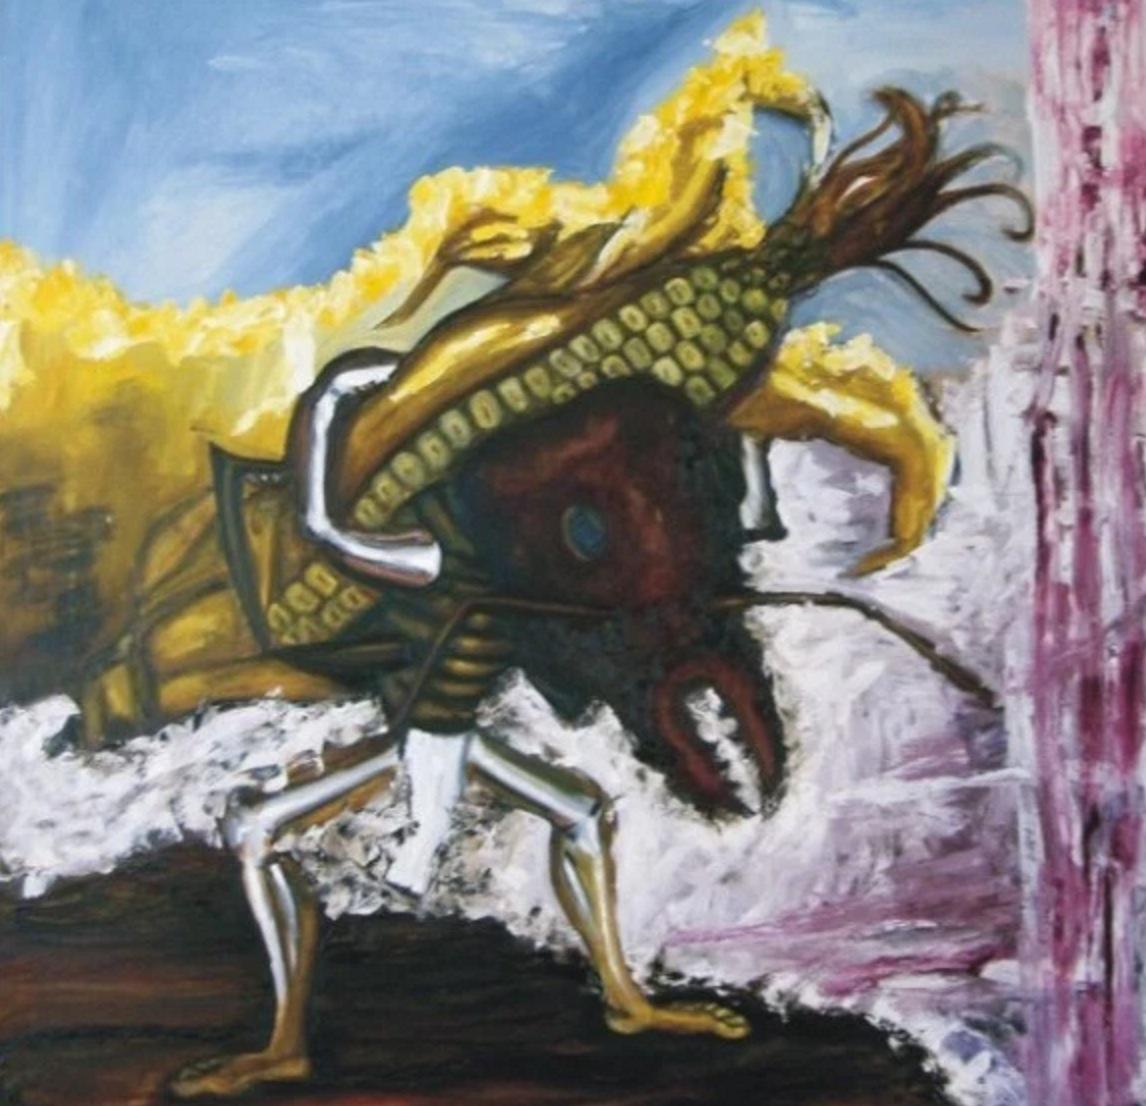 mito leyenda azteca origen maíz